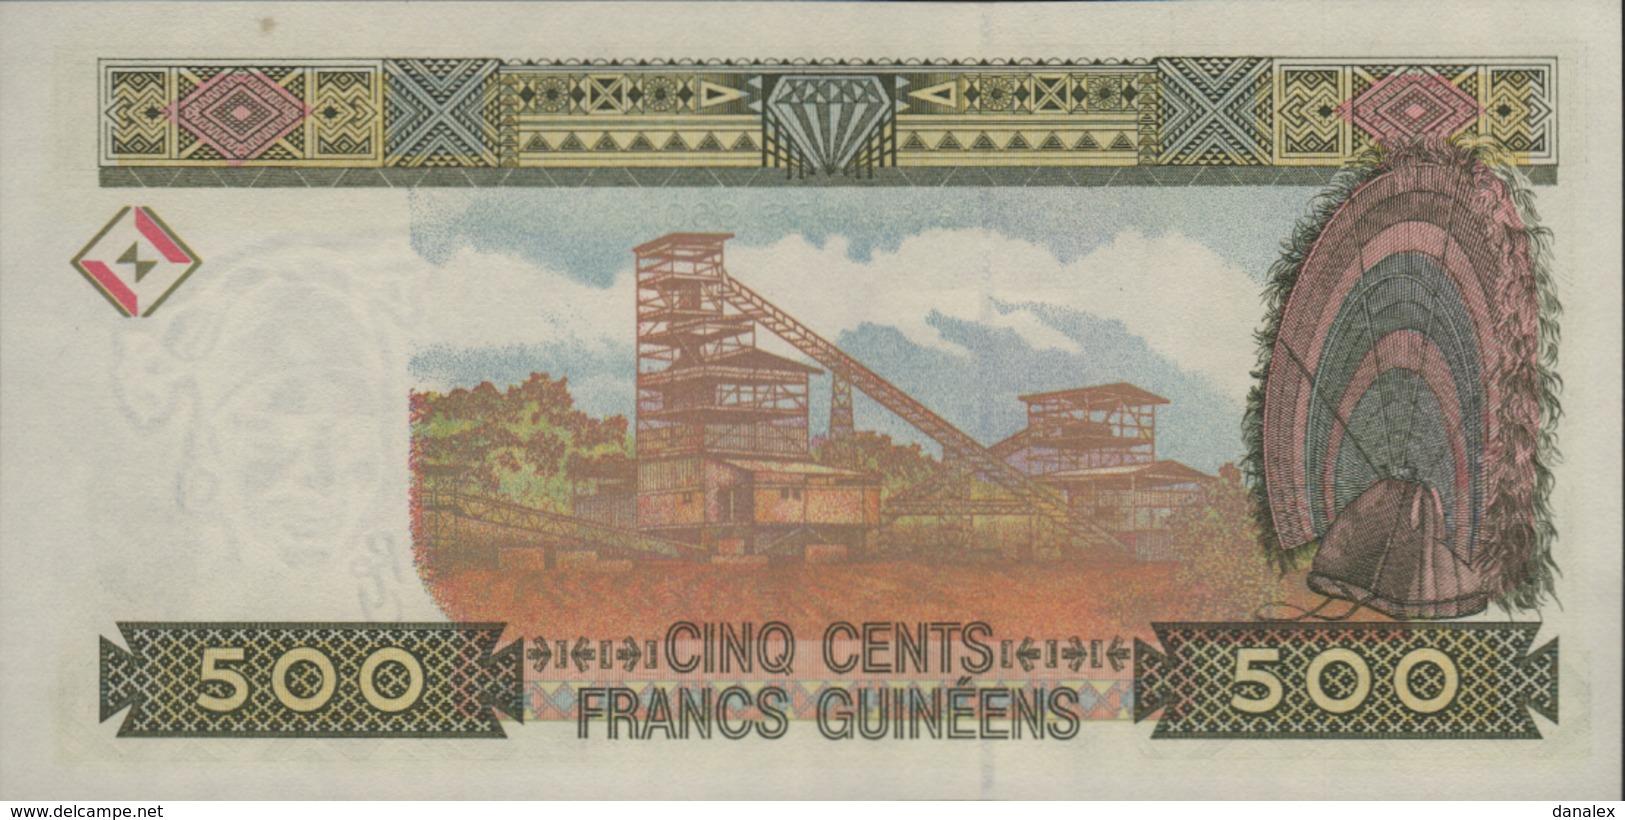 GUINEE 500 FRANCS GUINEENS De 1998  PICK 36  UNC/NEUF - Guinée